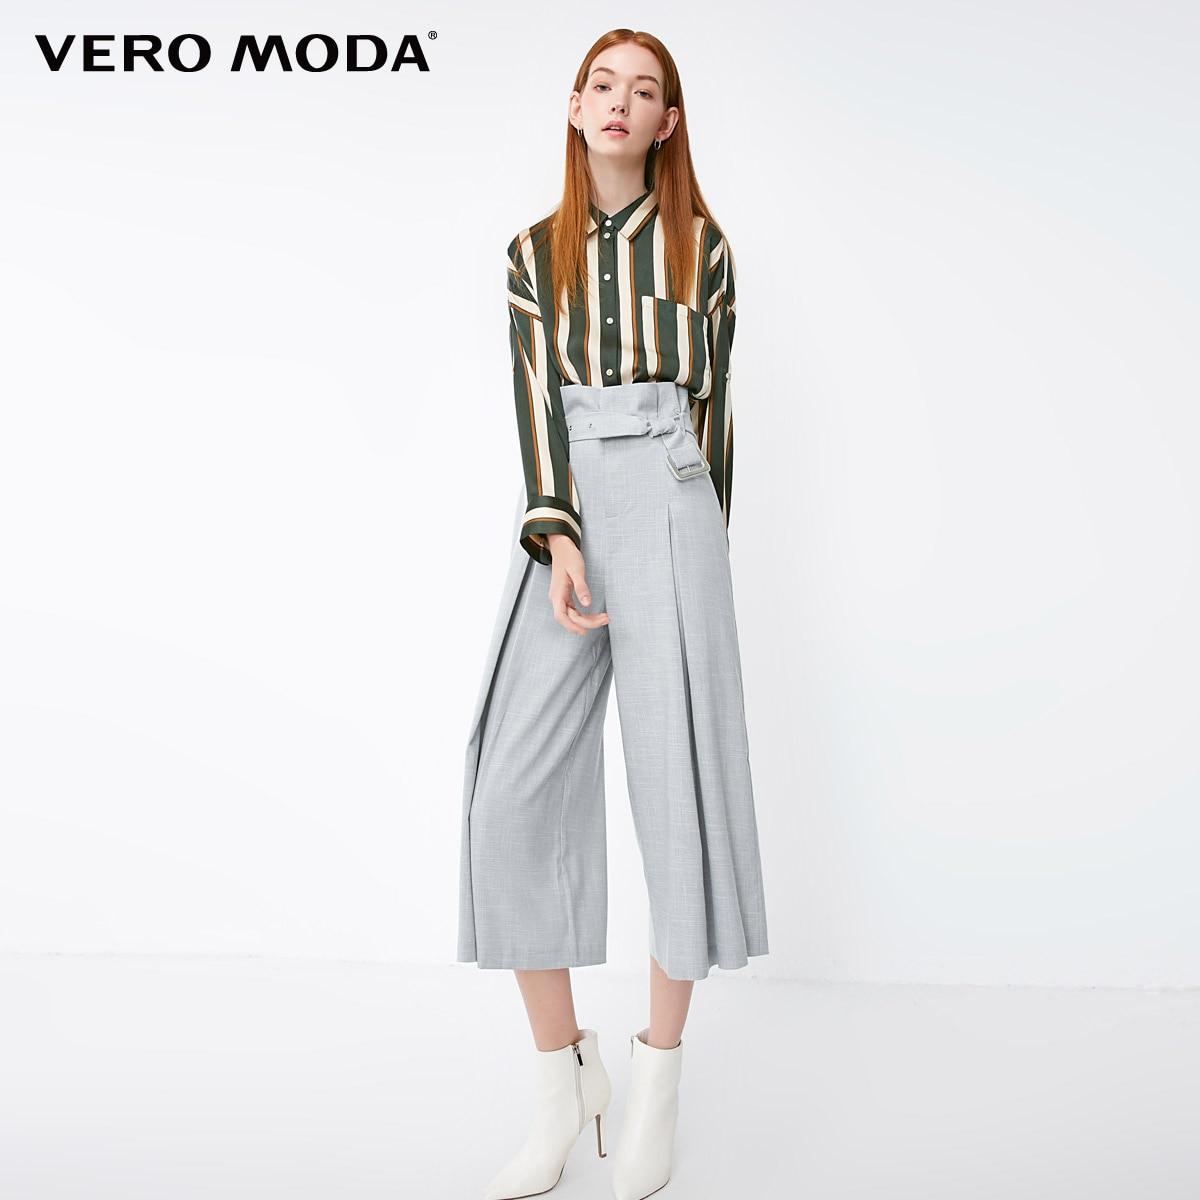 Vero Moda 2019 New Arrivals OL Style Women's High Waist Lace-up Casual   Capri     Pants   | 31846J502